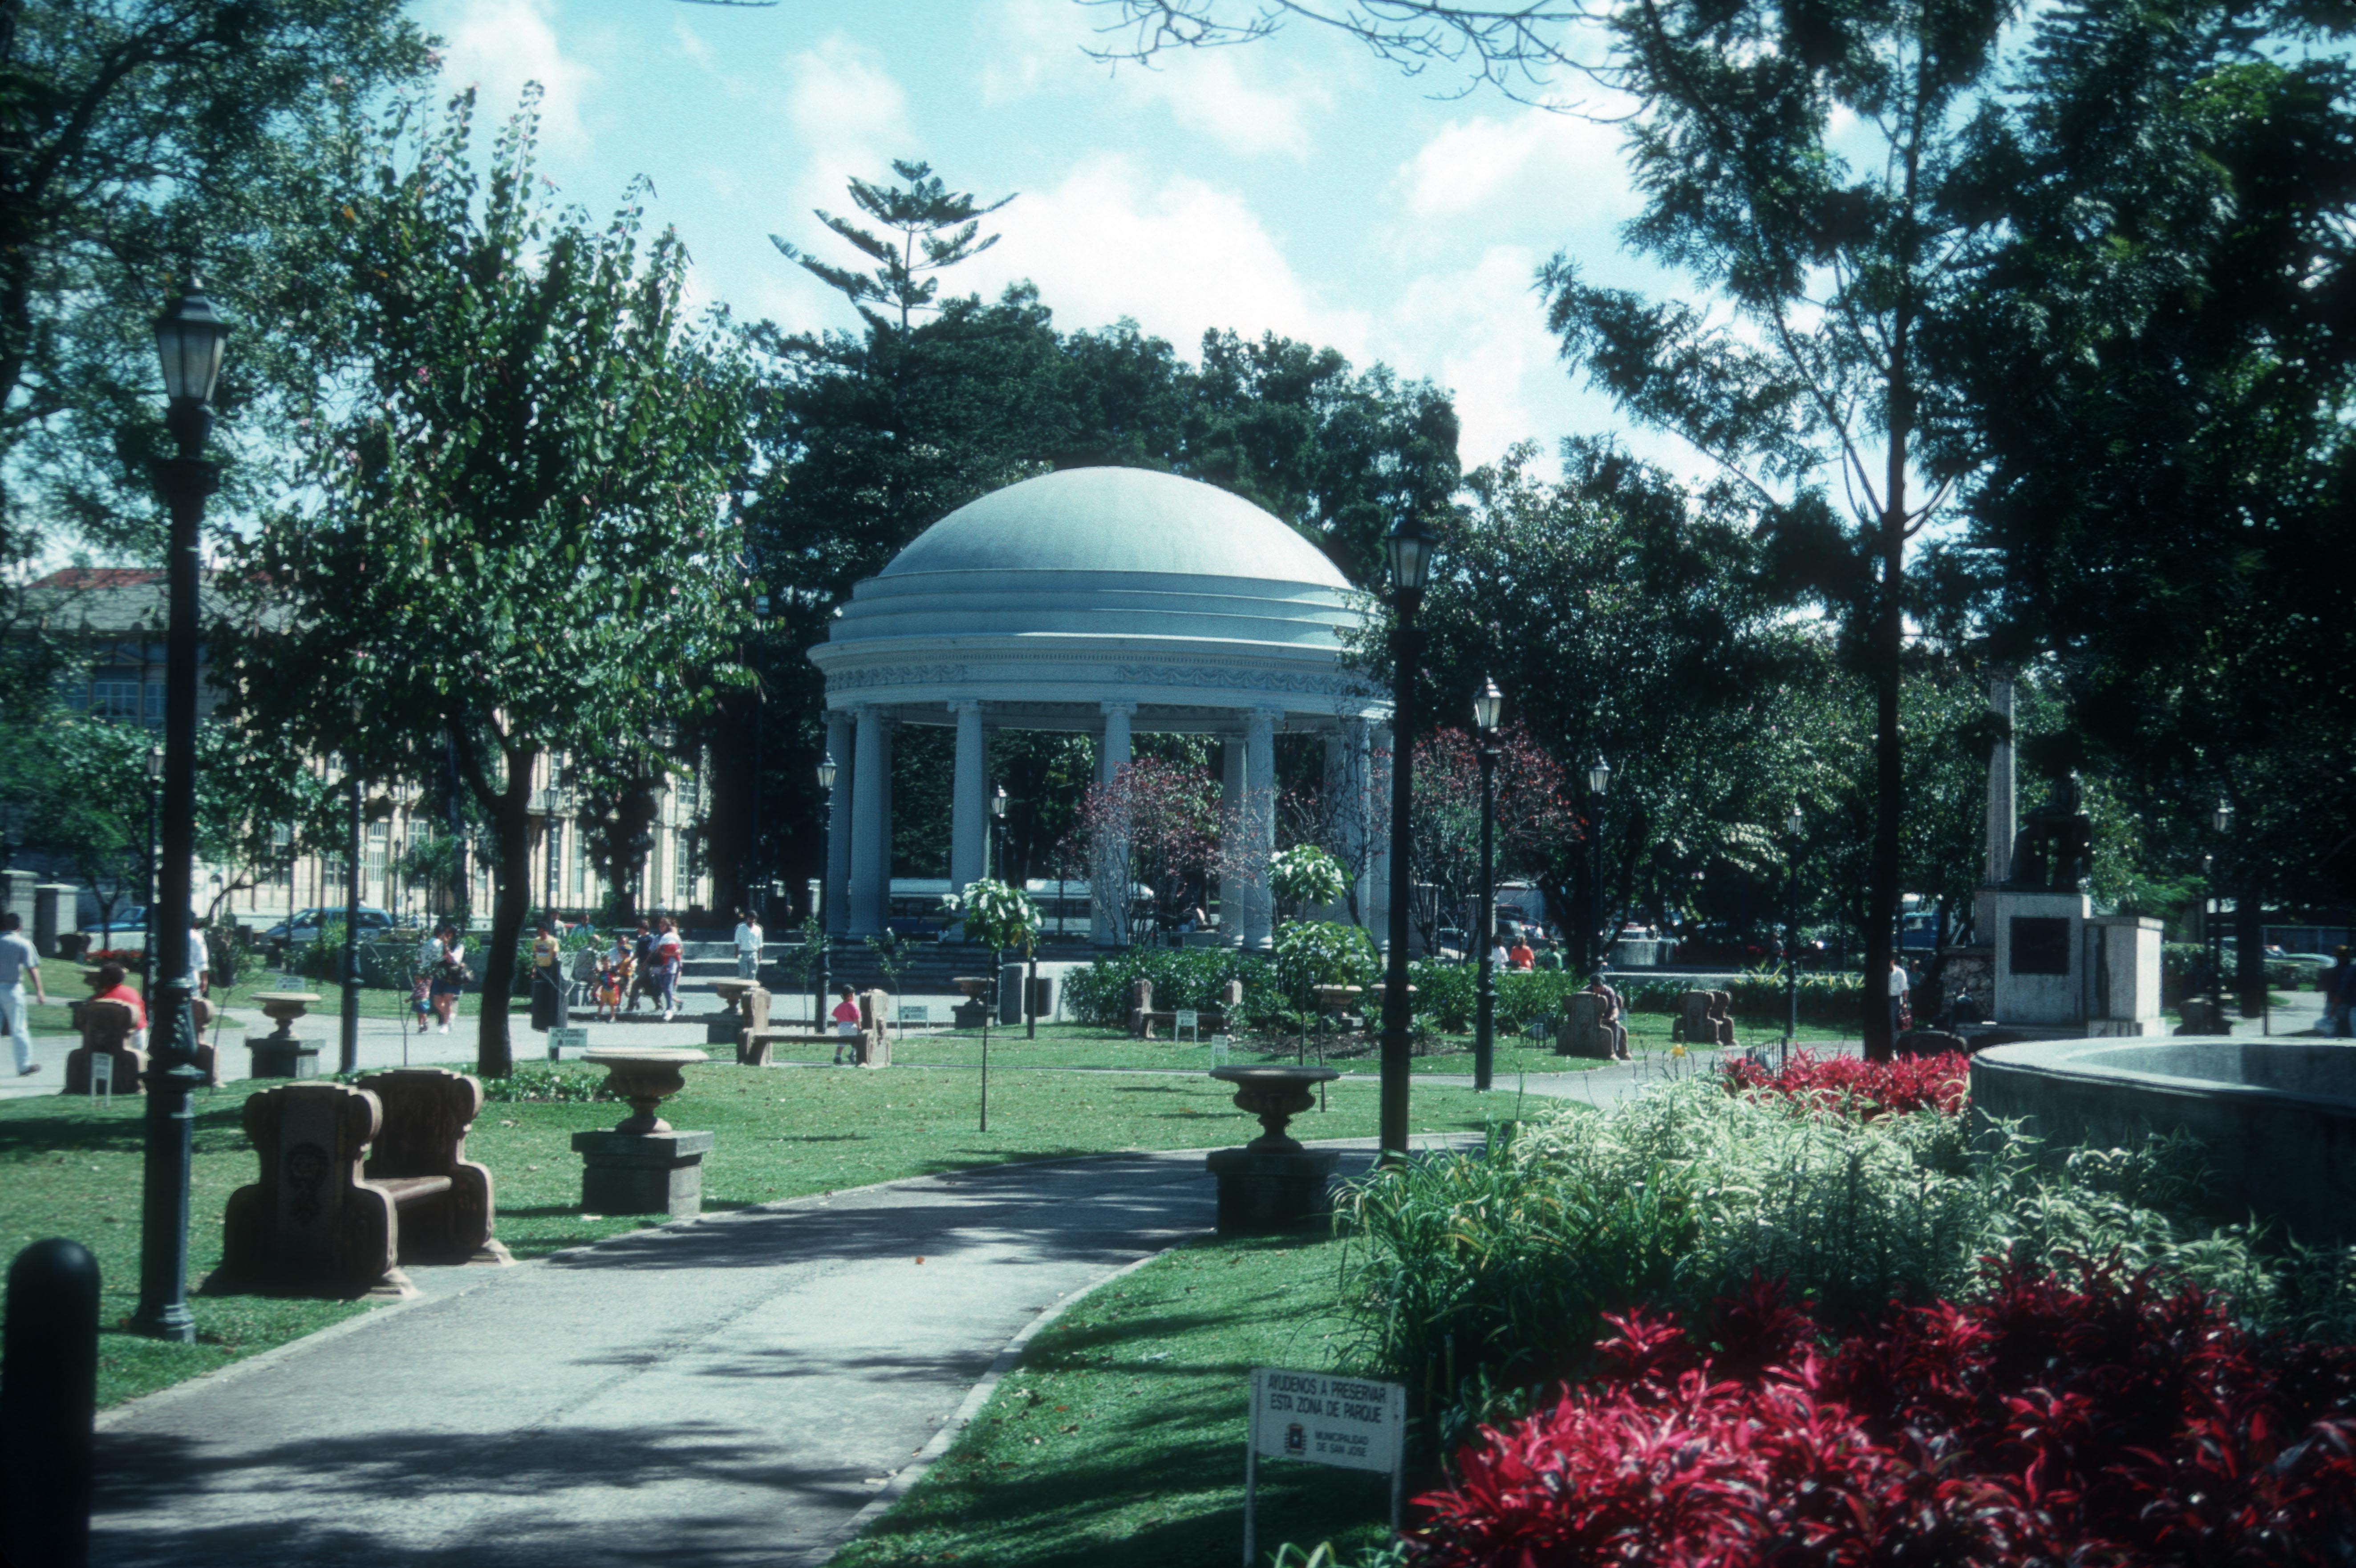 Park Plaza City Hall